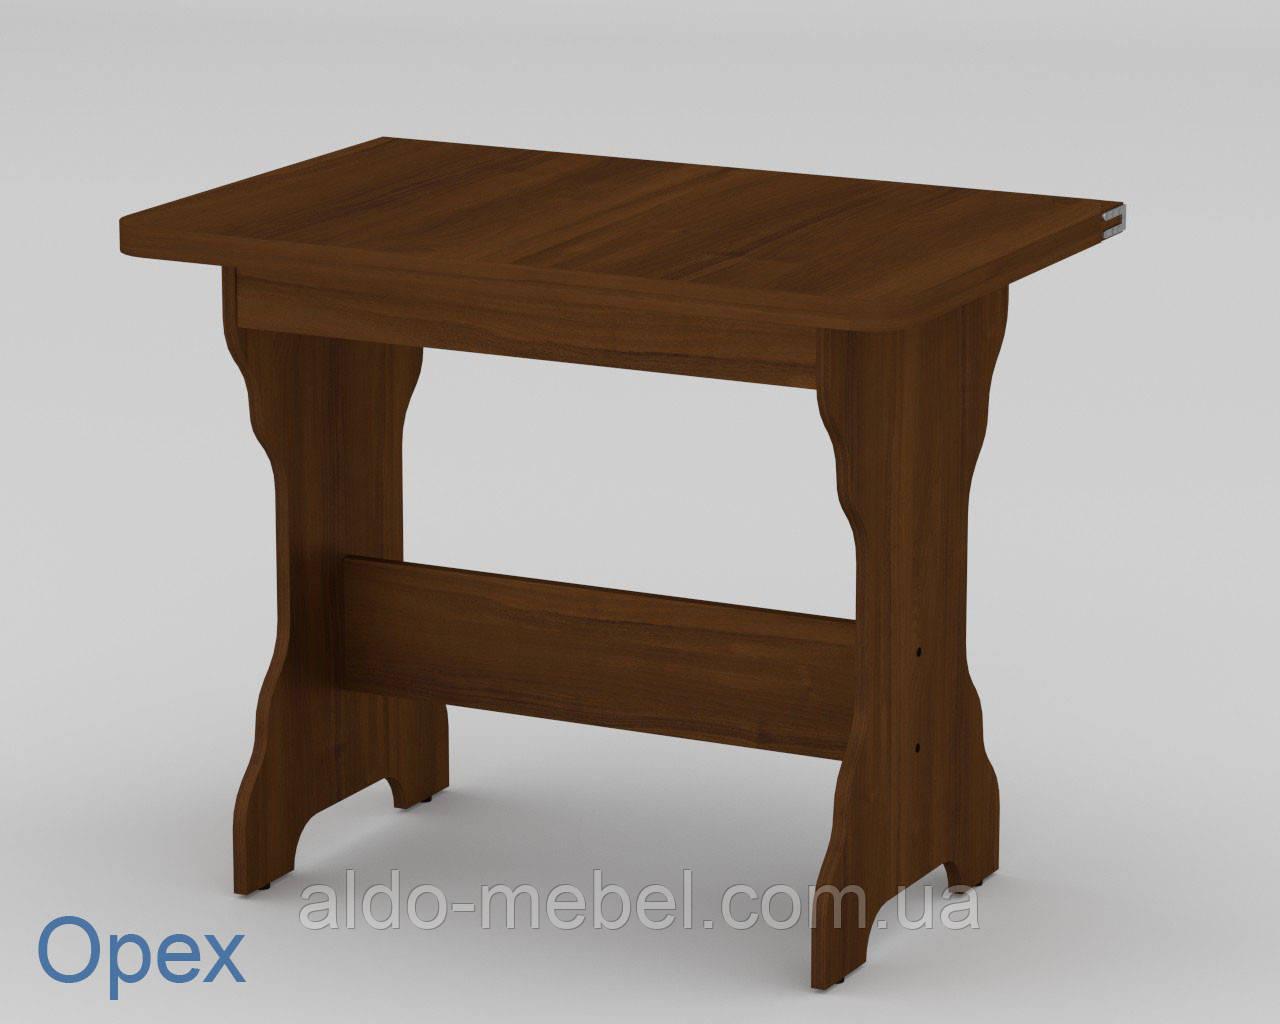 Стол кухонный КС - 3 Раскладной Габариты Ш - 900 мм; В - 732 мм; Г - 590 мм (Общая 1180х716х590) (Компанит)